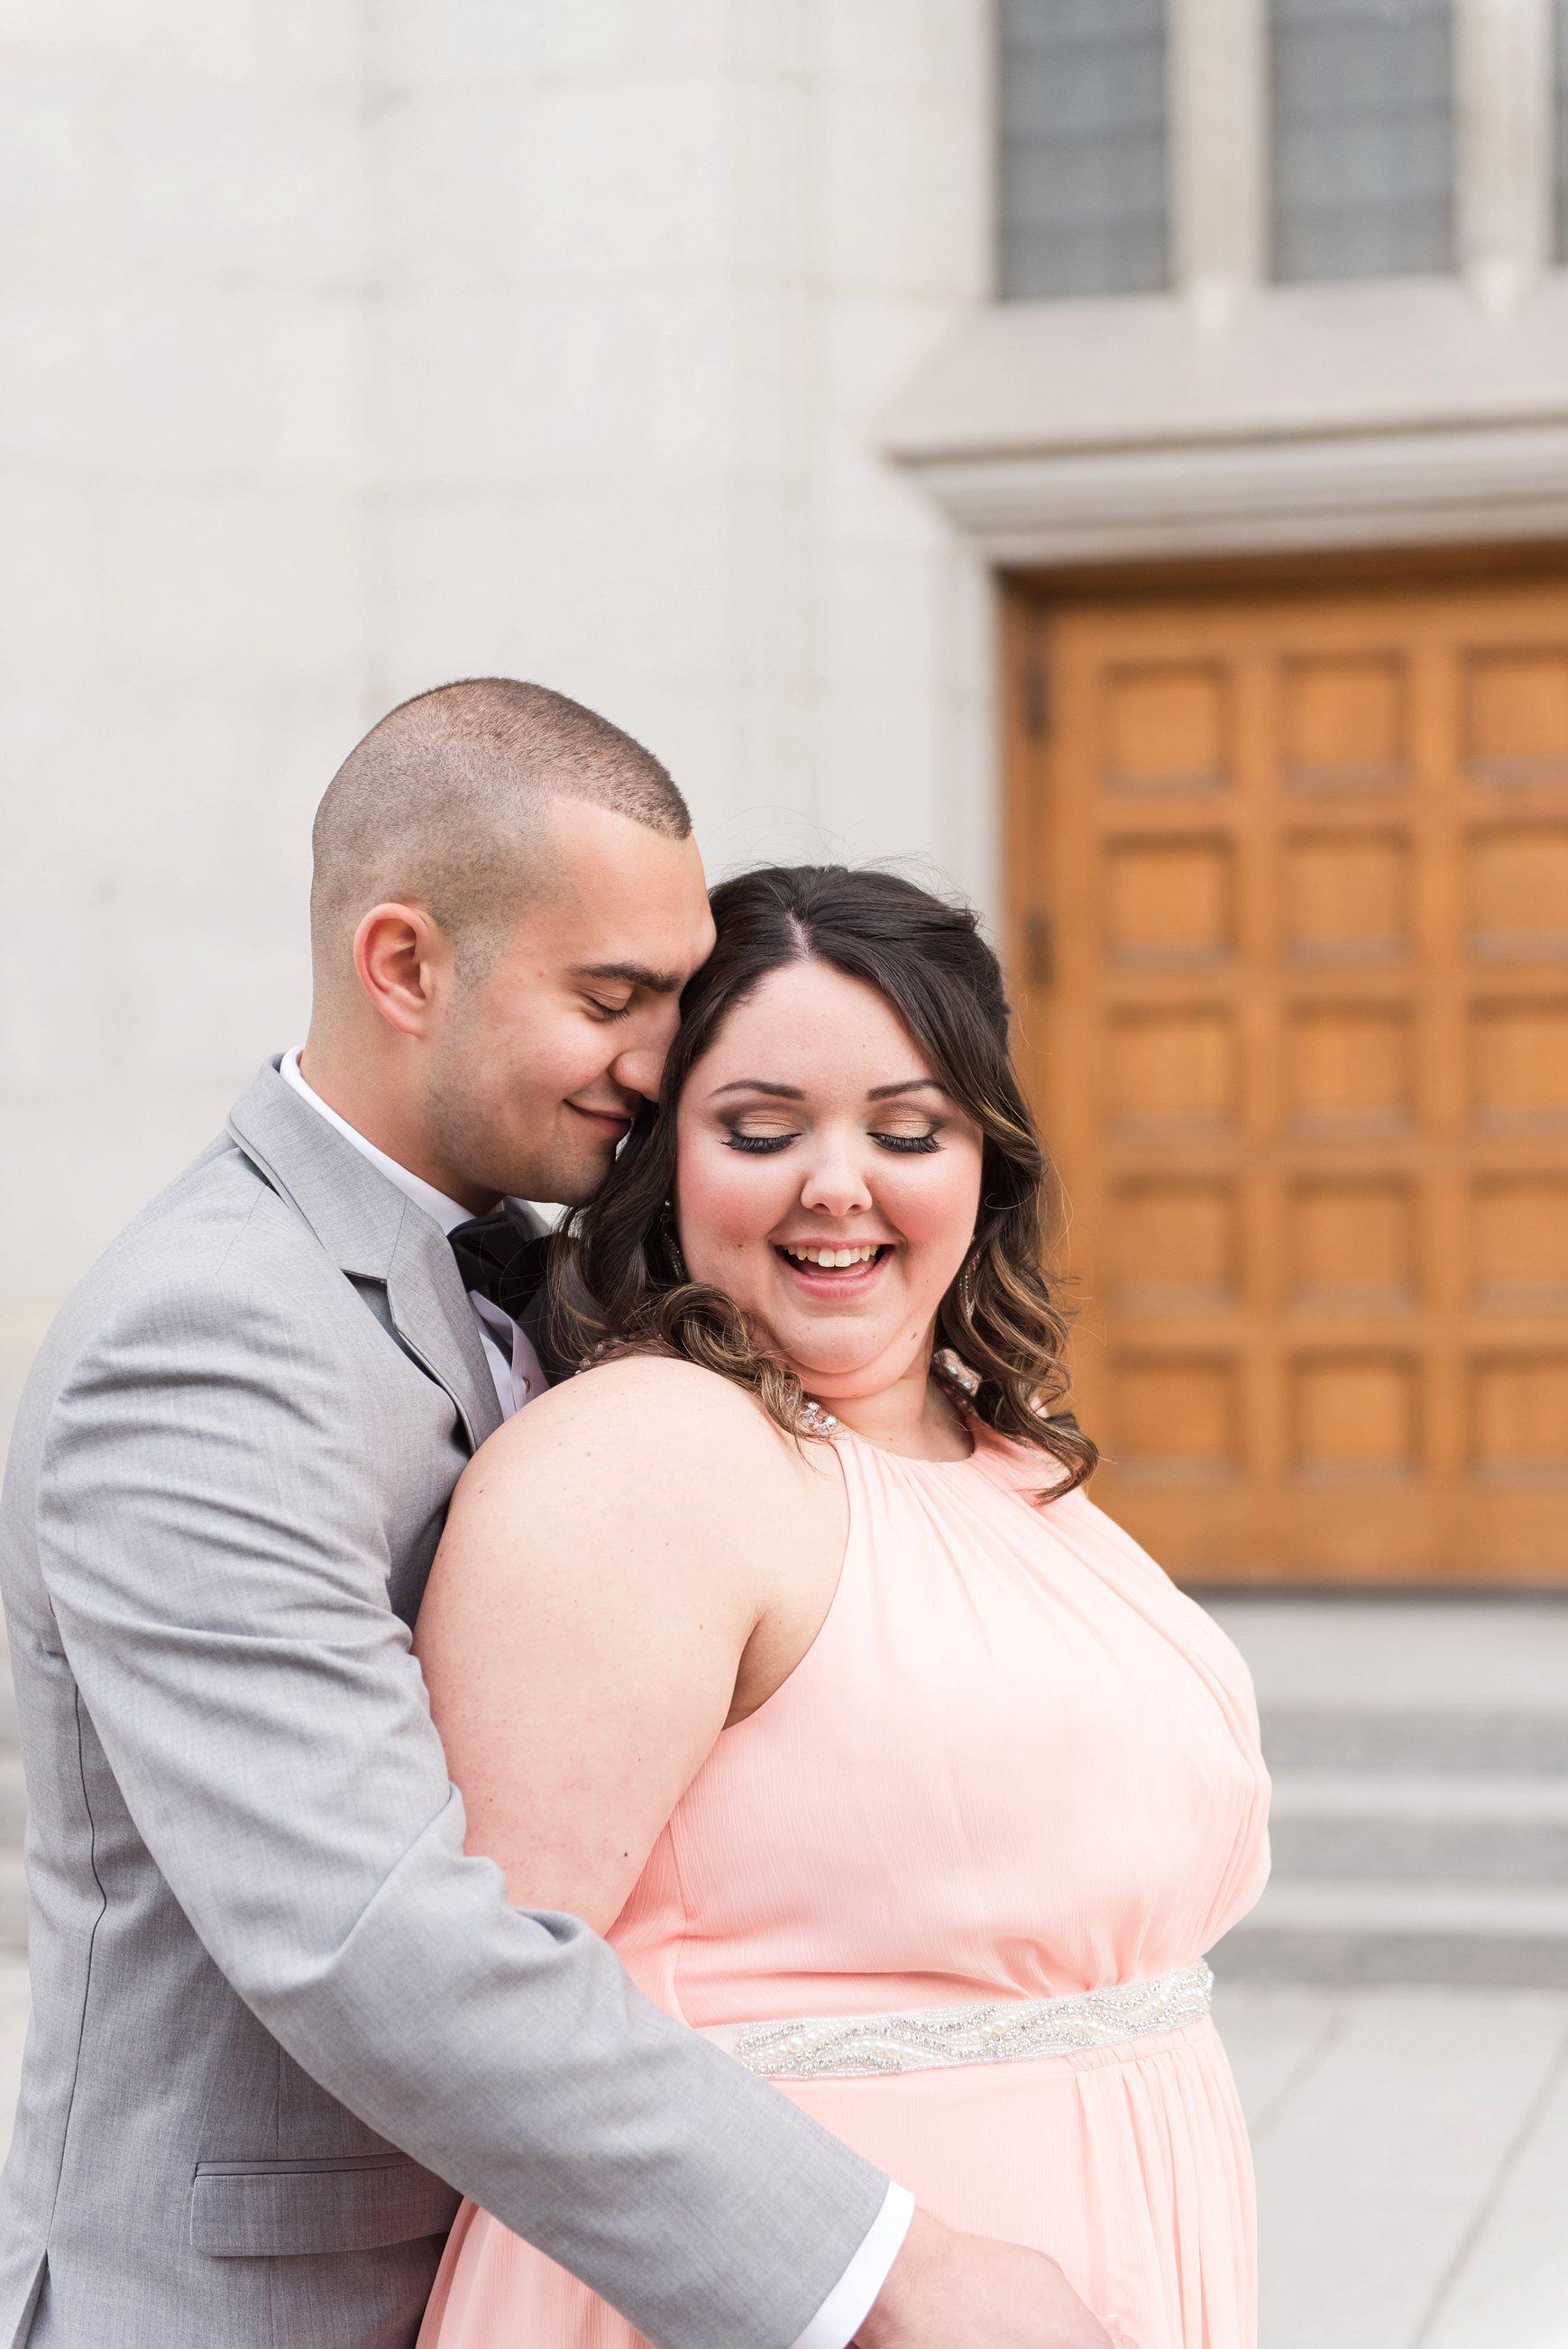 Sarmad Ashley Engagement Shoot- Ali Batoul Creatives Fine Art Wedding Photography_0076.jpg